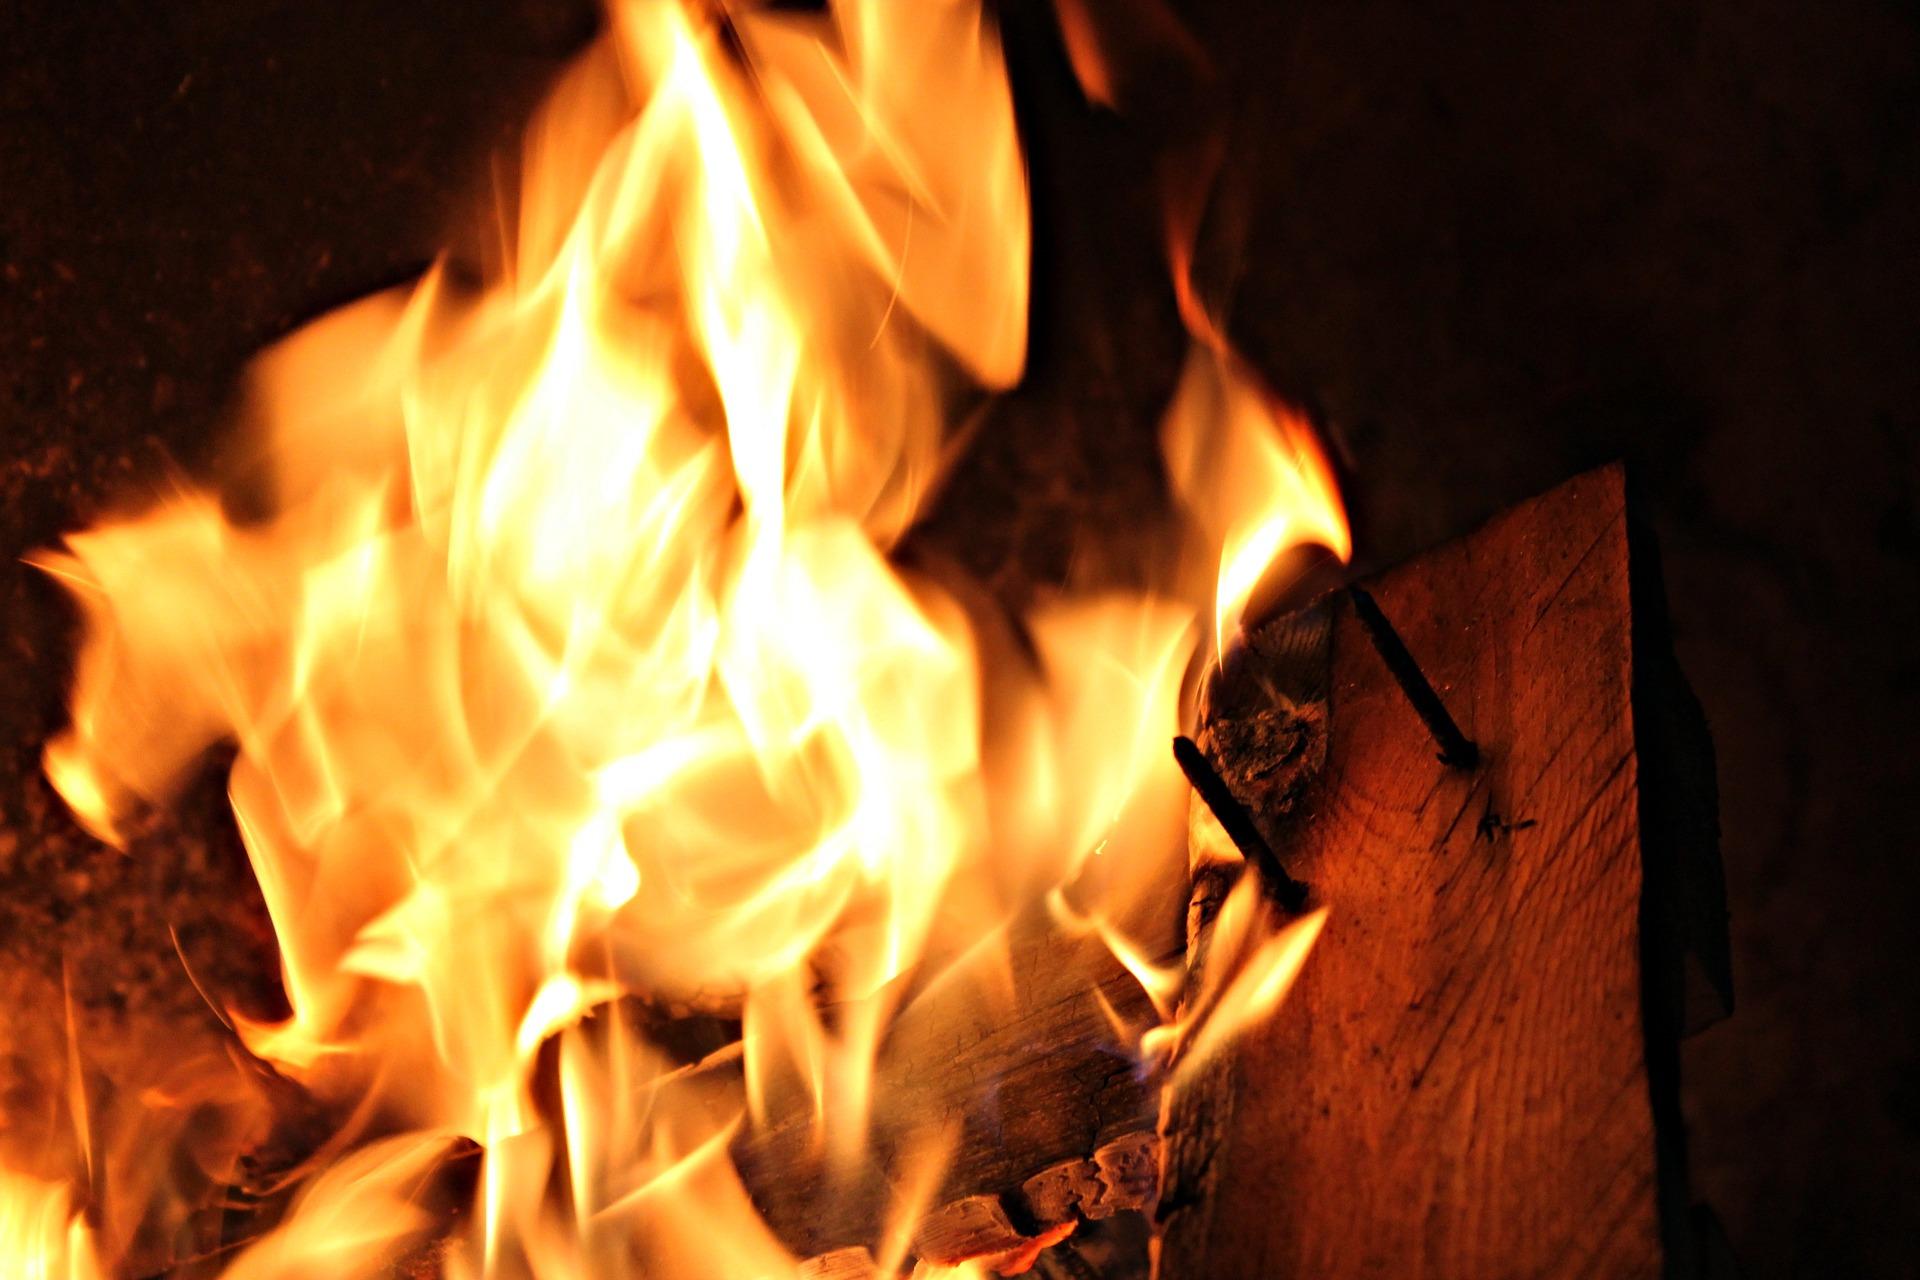 Женщина подожгла дом бывшему супругу